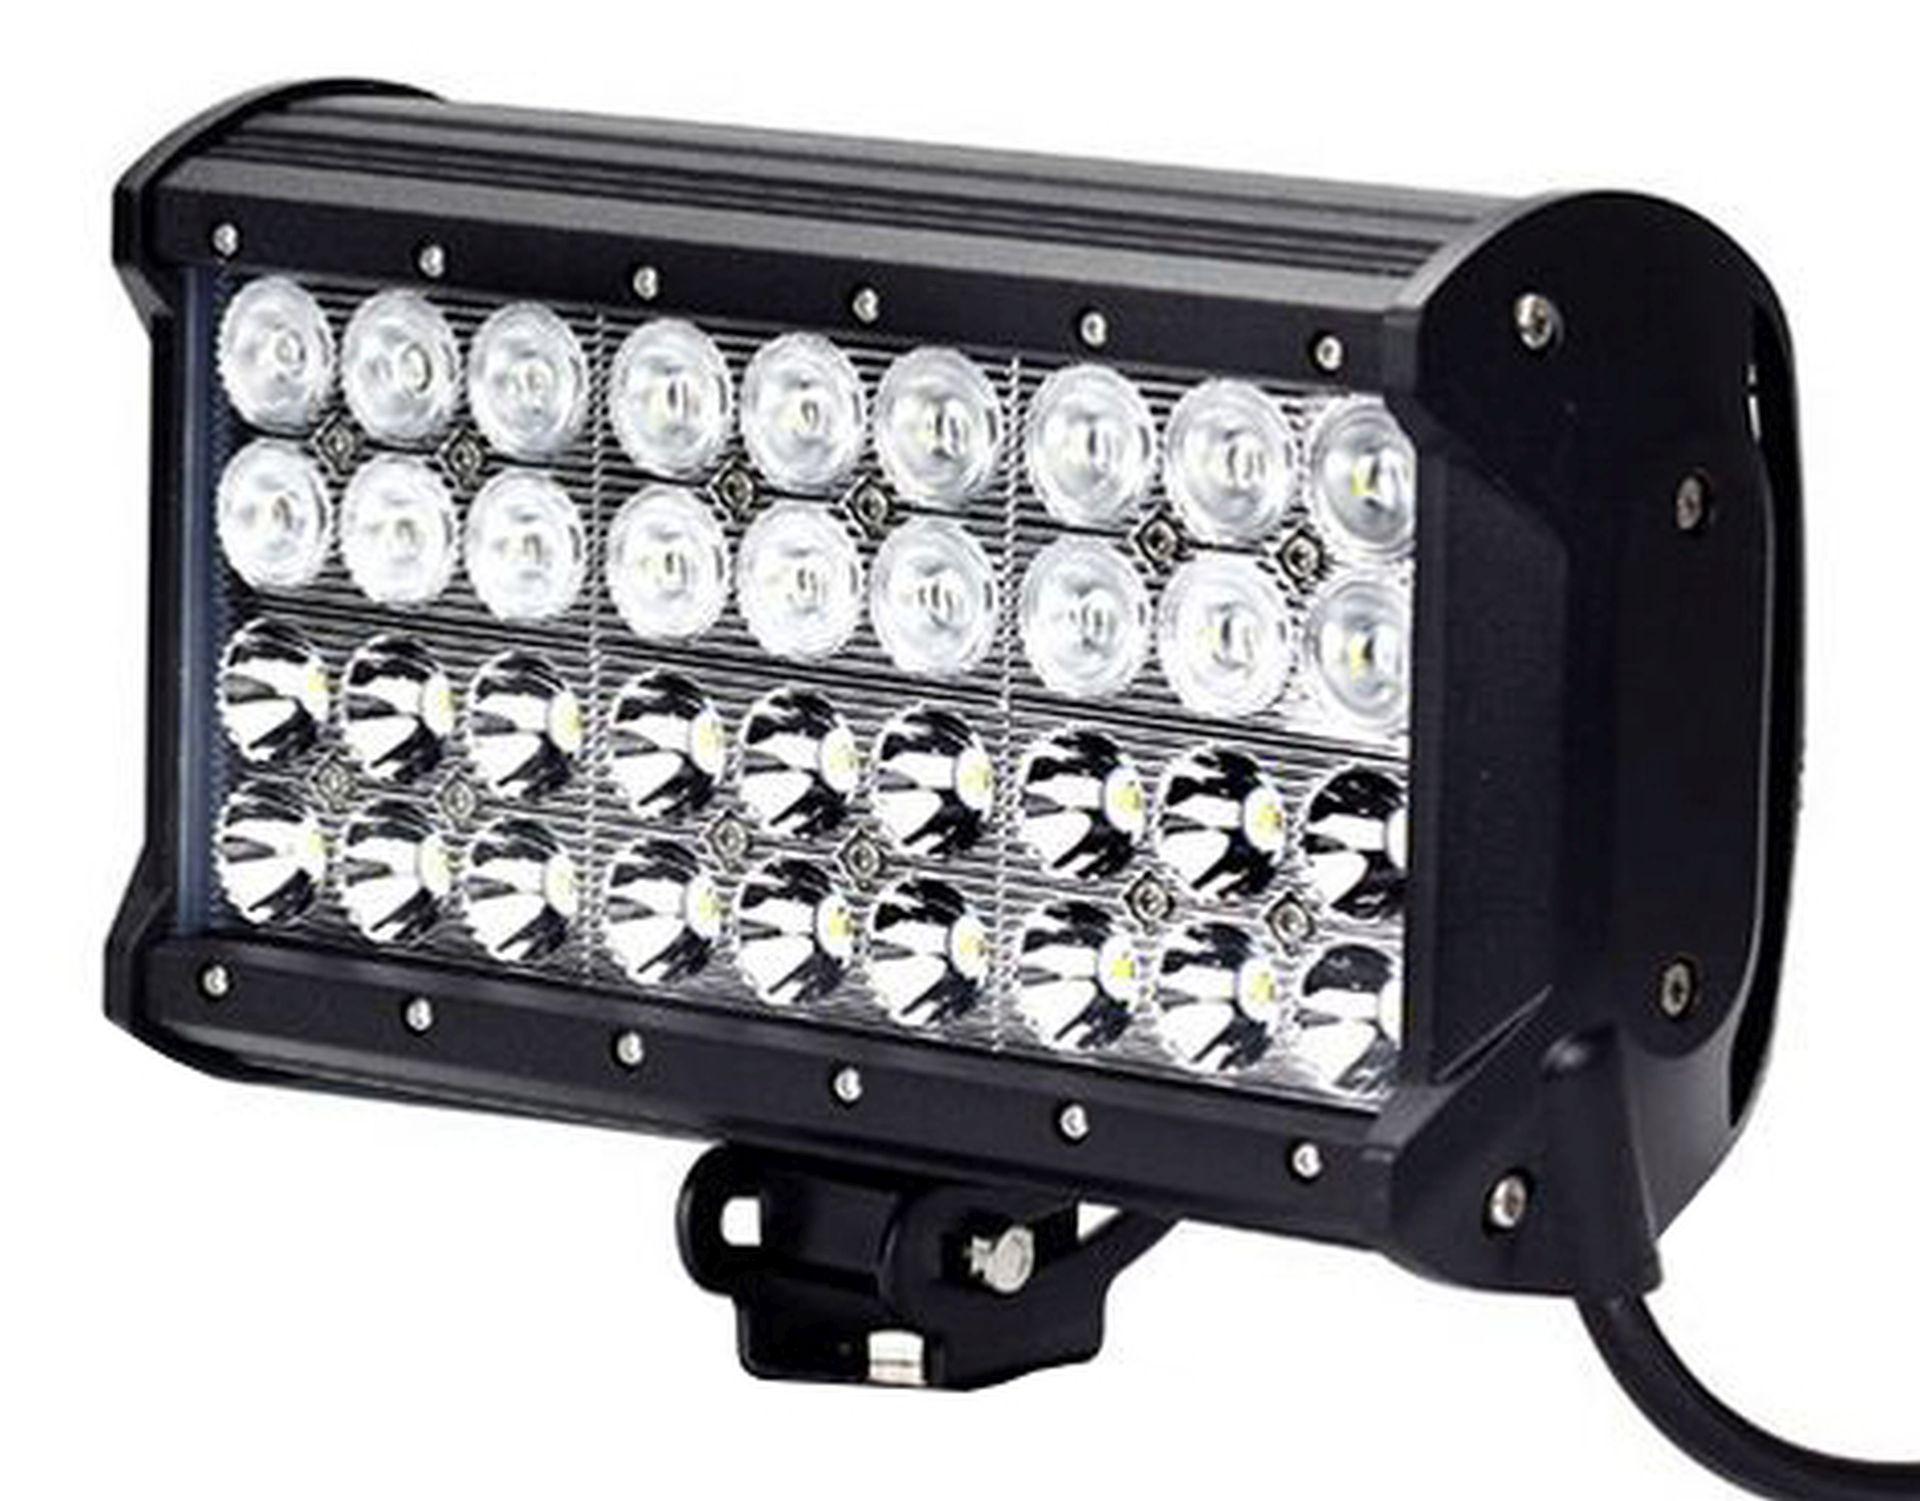 LED Solution LED pracovné svetlo 108W BAR 10-30V 4-rady LB0044